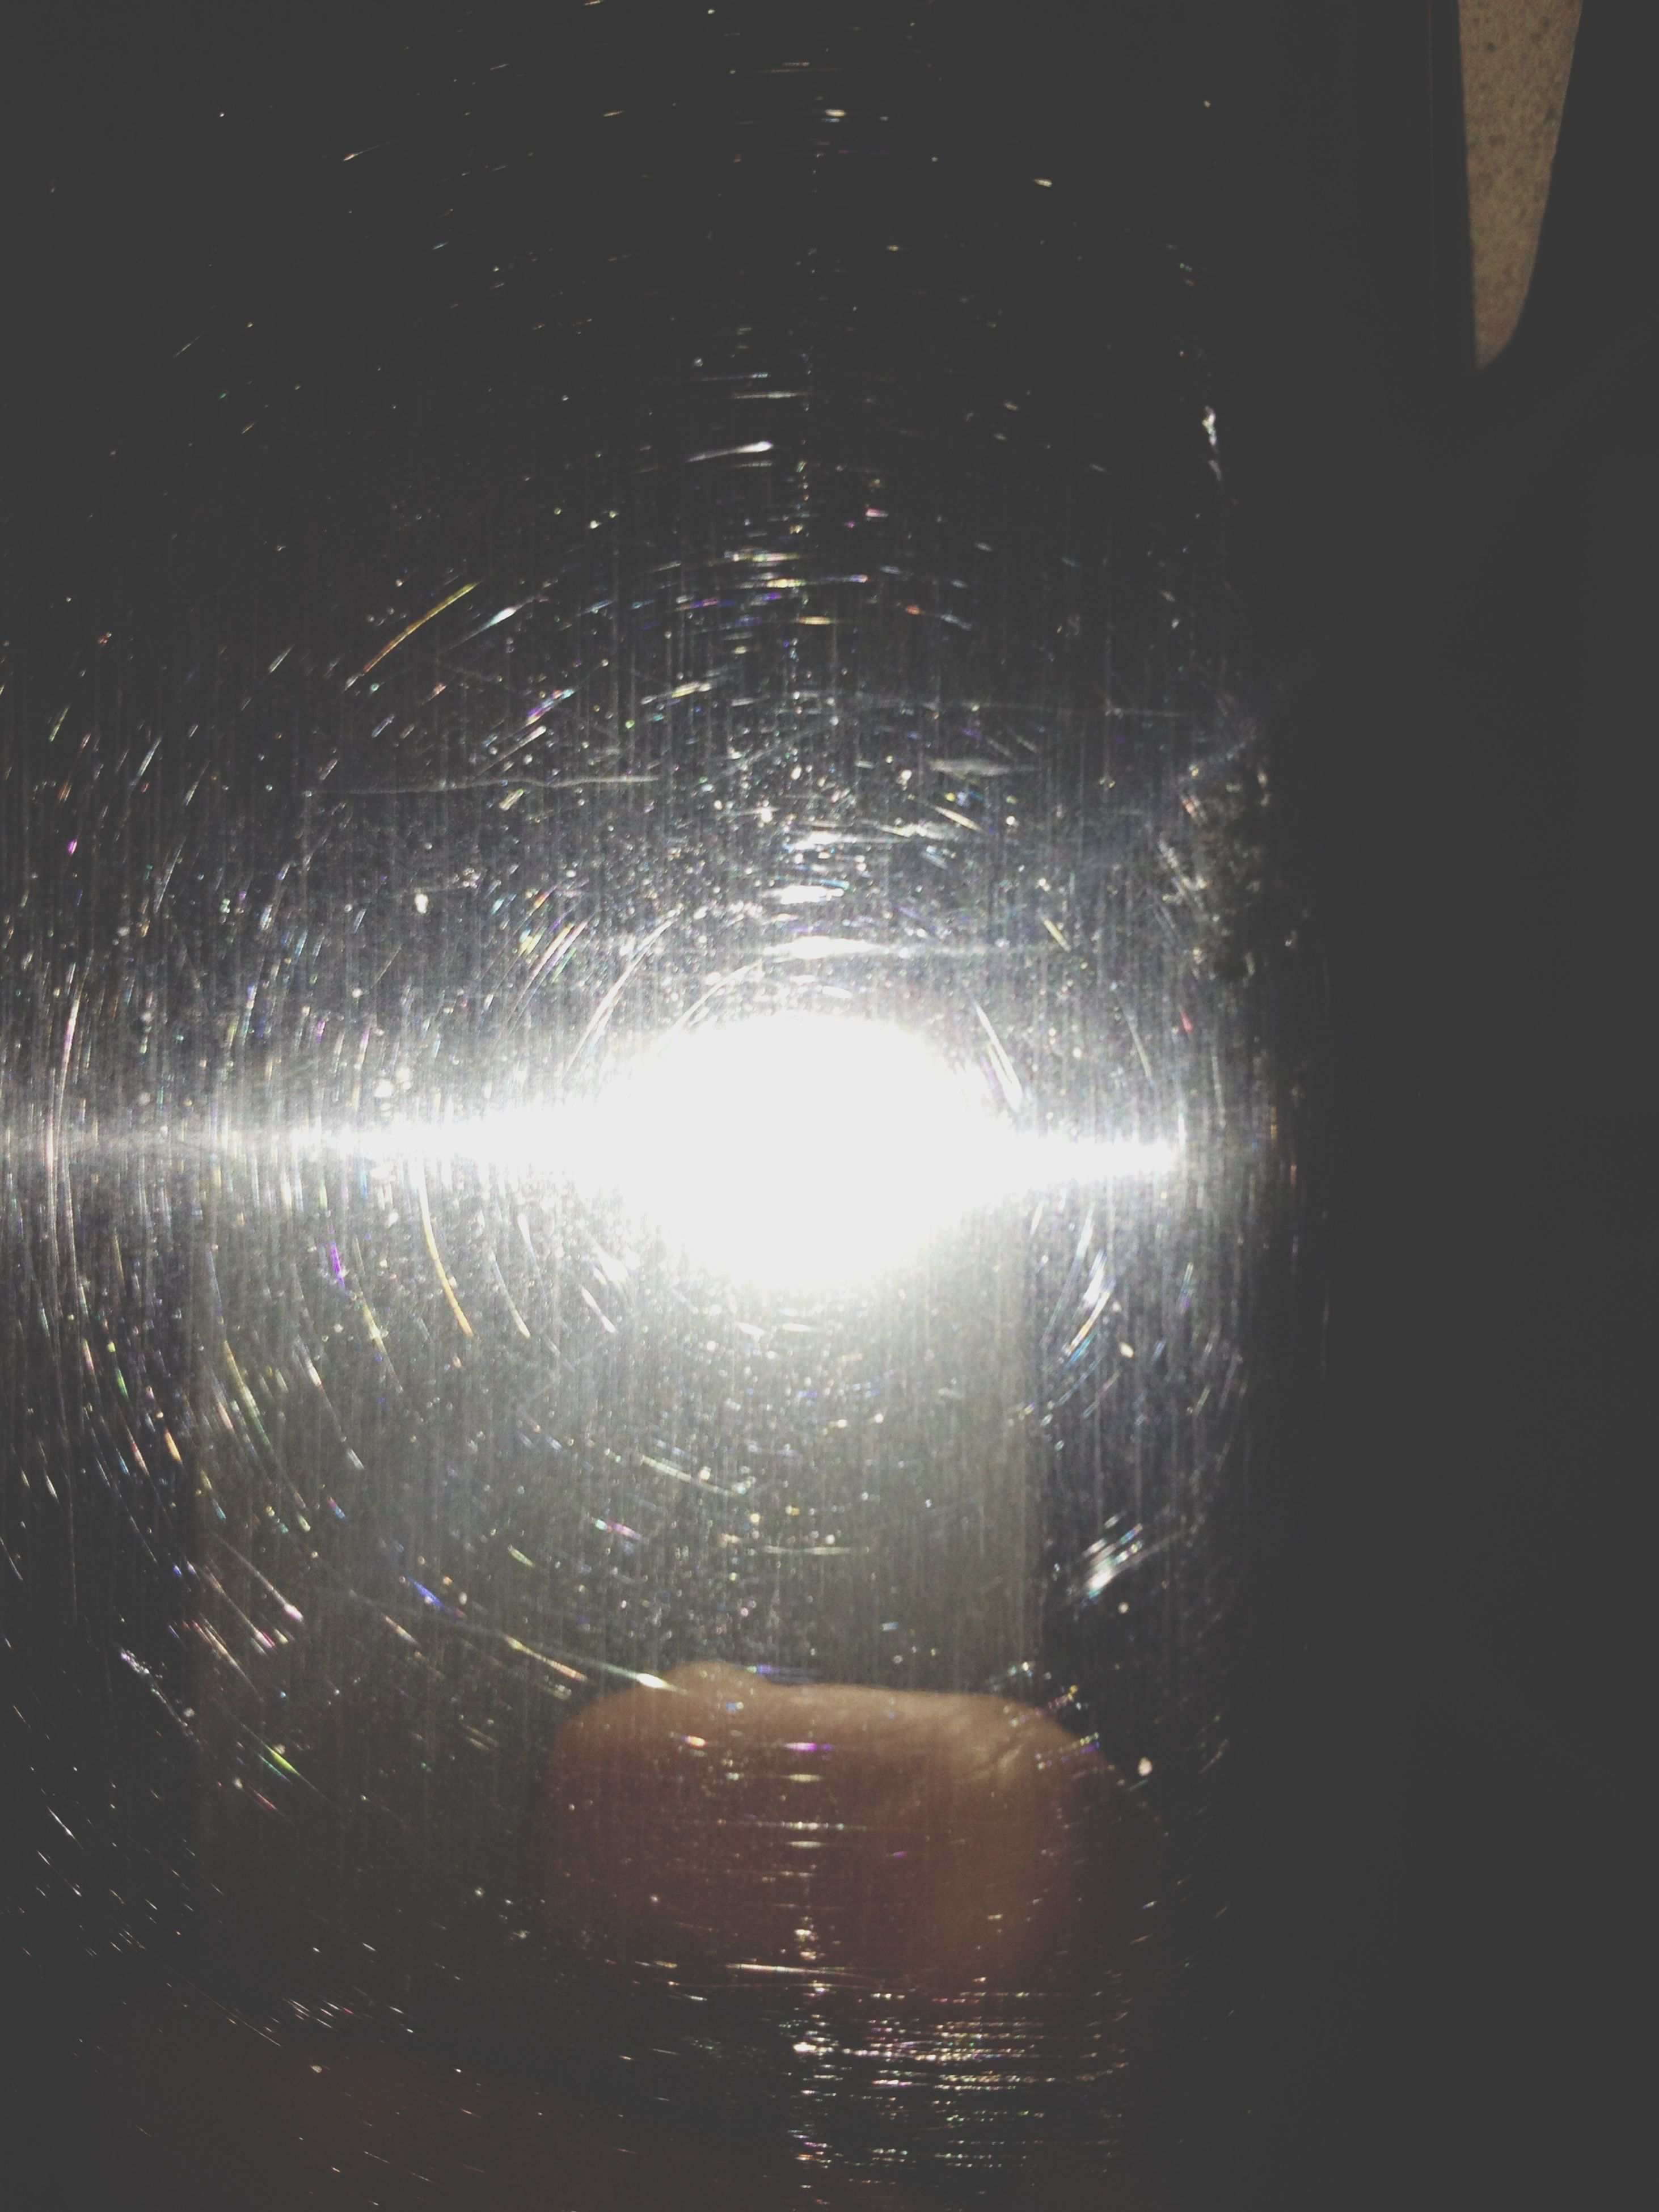 night, water, illuminated, indoors, window, wet, glass - material, drop, rain, transparent, reflection, season, dark, glowing, pattern, weather, full frame, light - natural phenomenon, no people, backgrounds